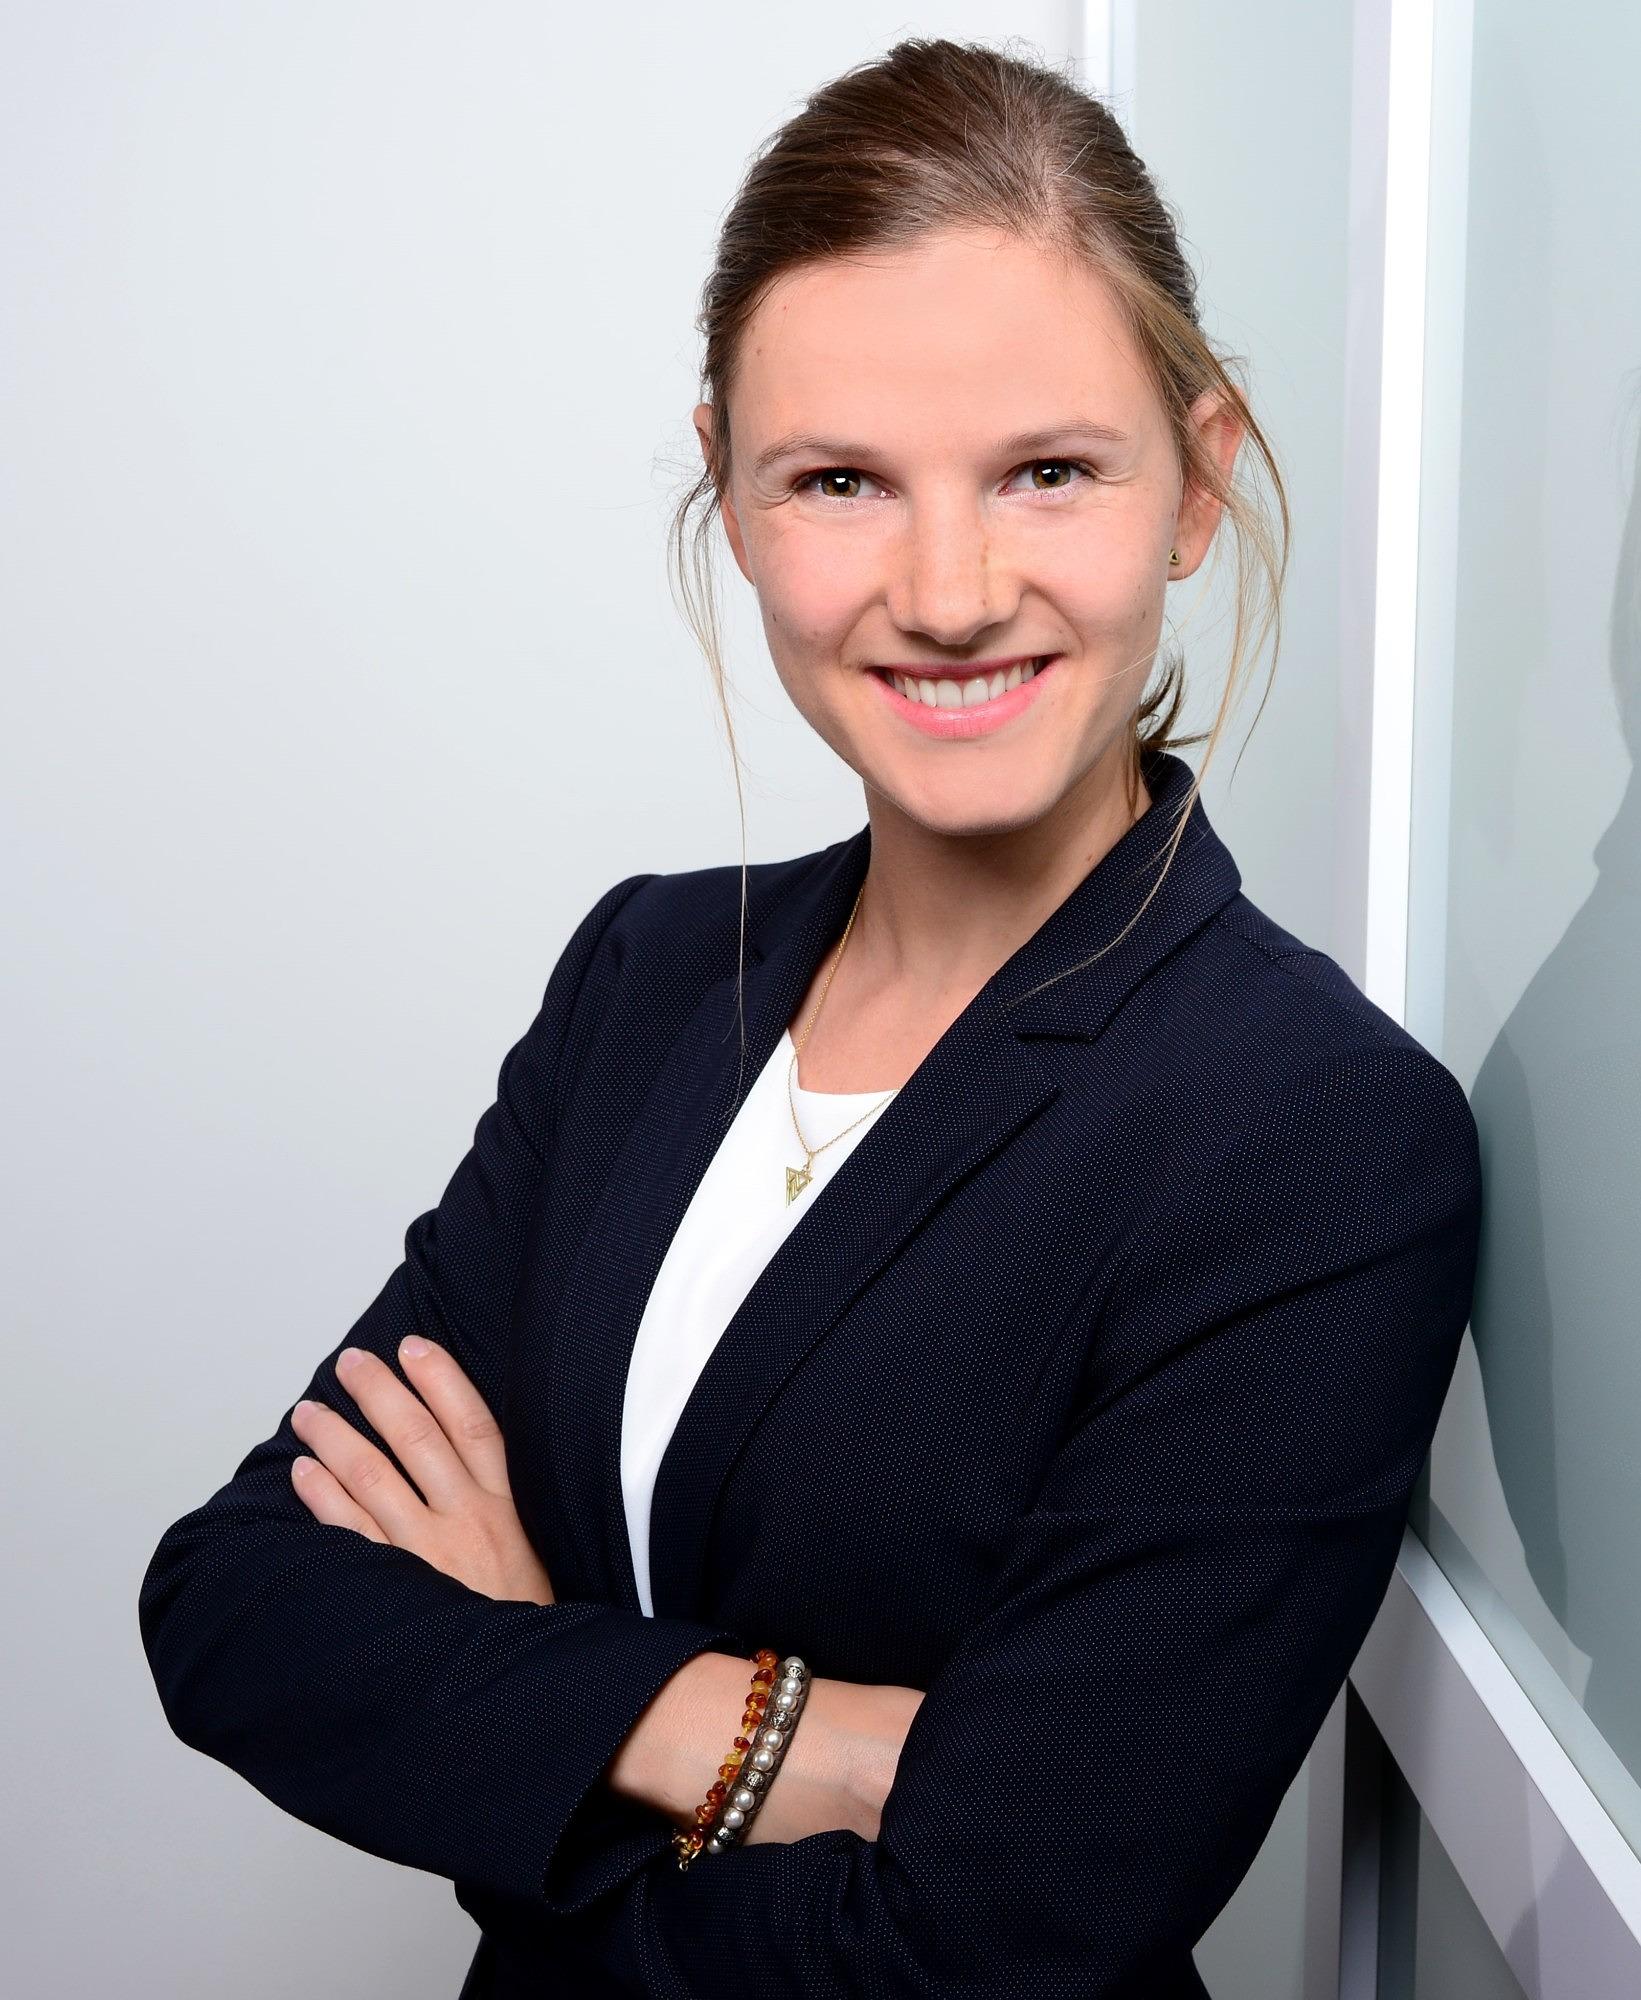 Natalie Helsper